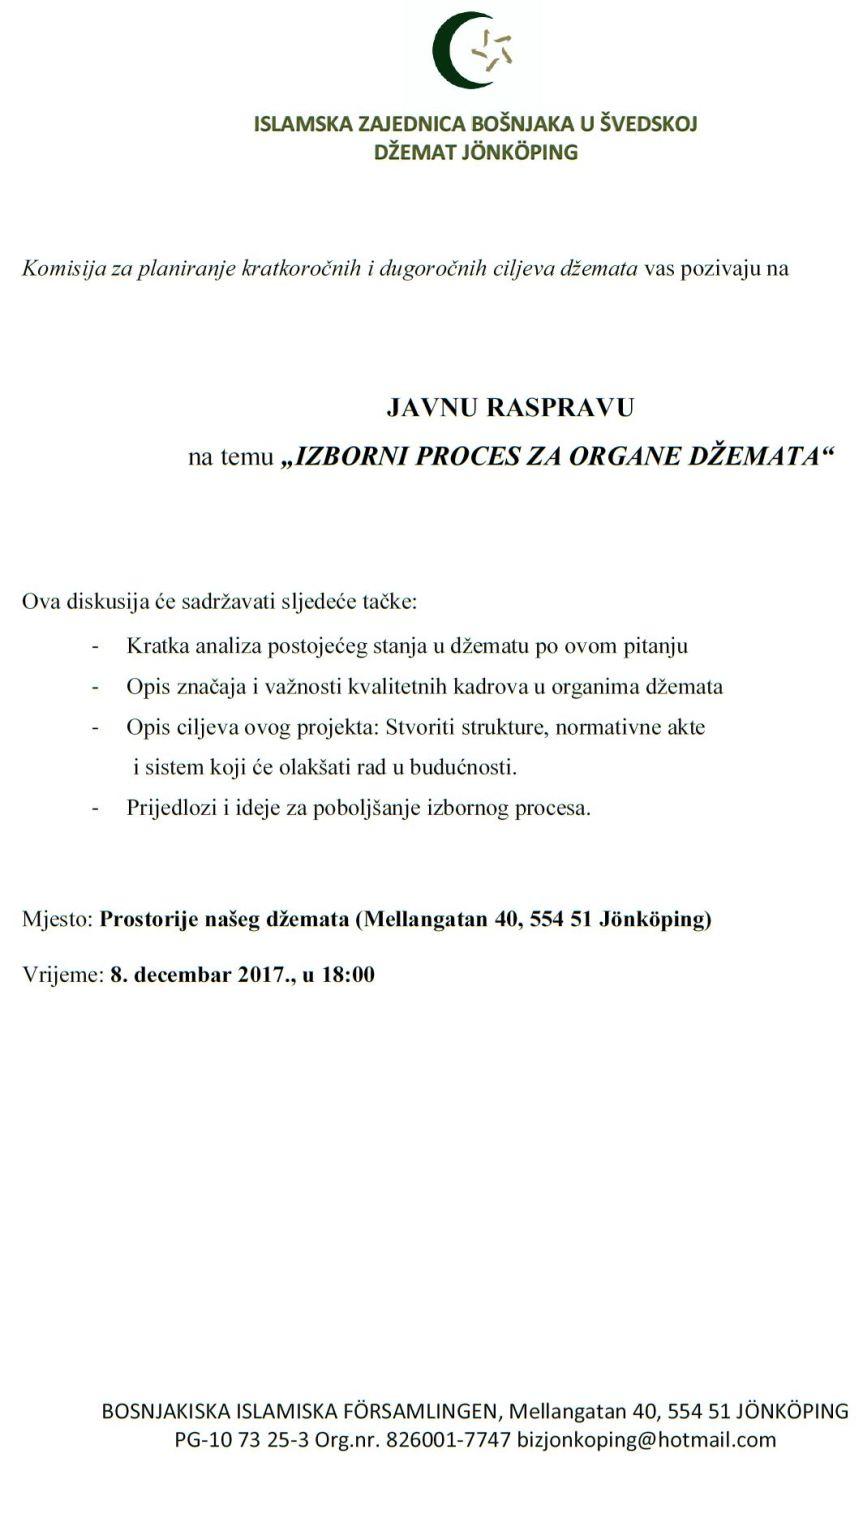 JAVNA RASPRAVA 8. DECEMBAR